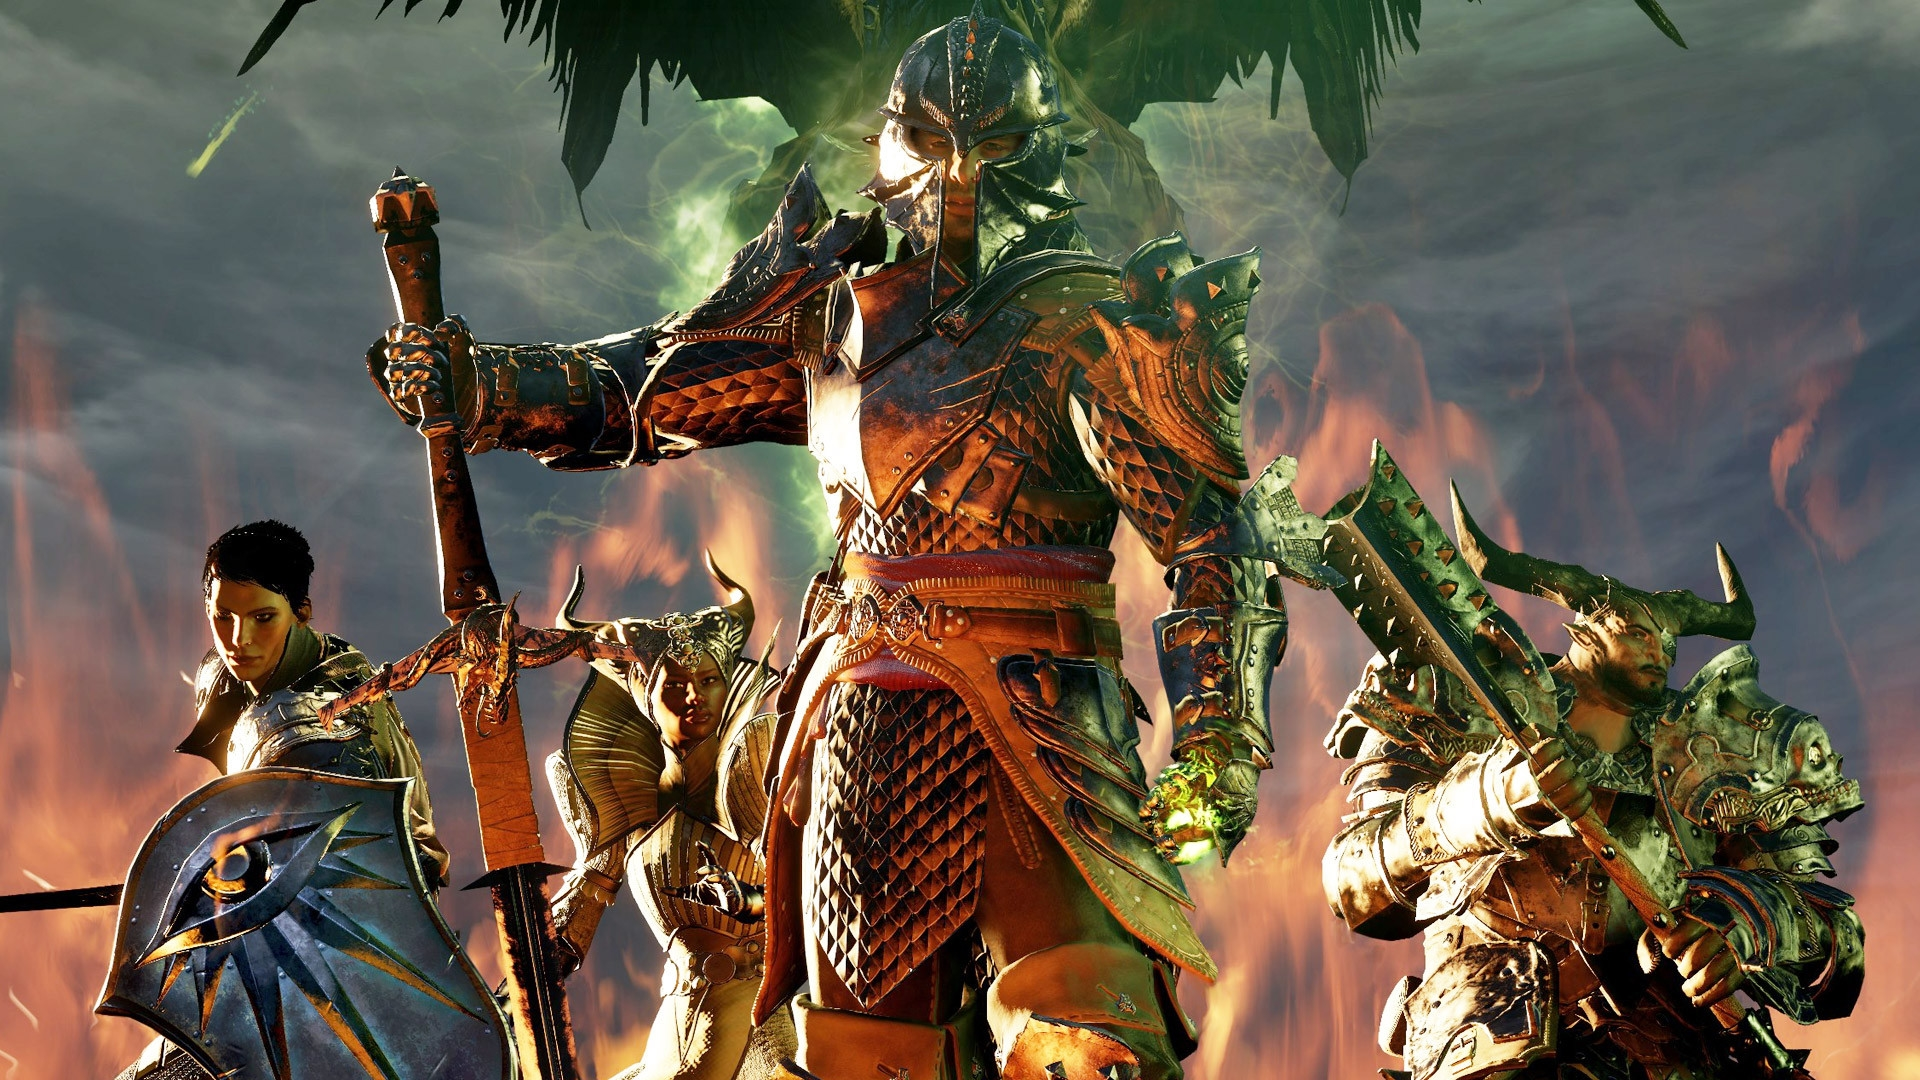 Dragon Age Inquisition good wallpaper hd